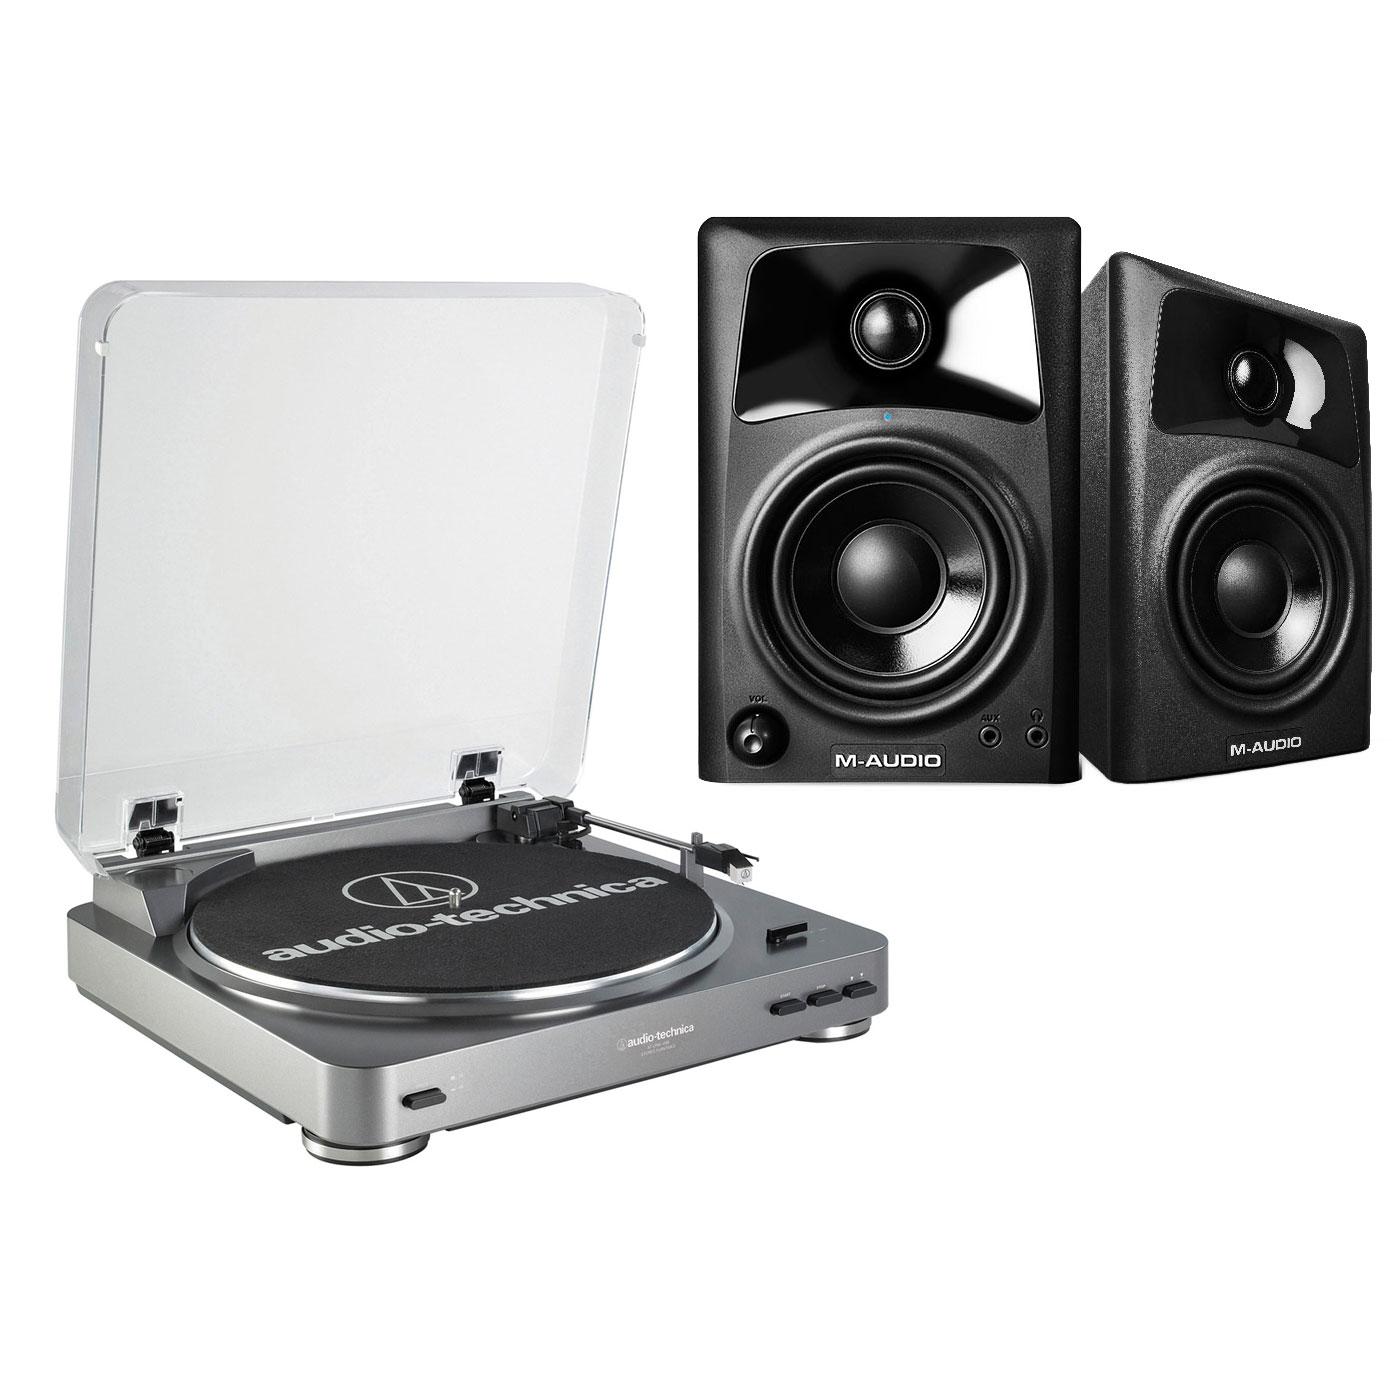 Platine vinyle Audio-Technica AT-LP60USB + M-Audio AV 32 Platine vinyle à 2 vitesses (33-45 trs/min) + Enceintes de monitoring actives 2.0